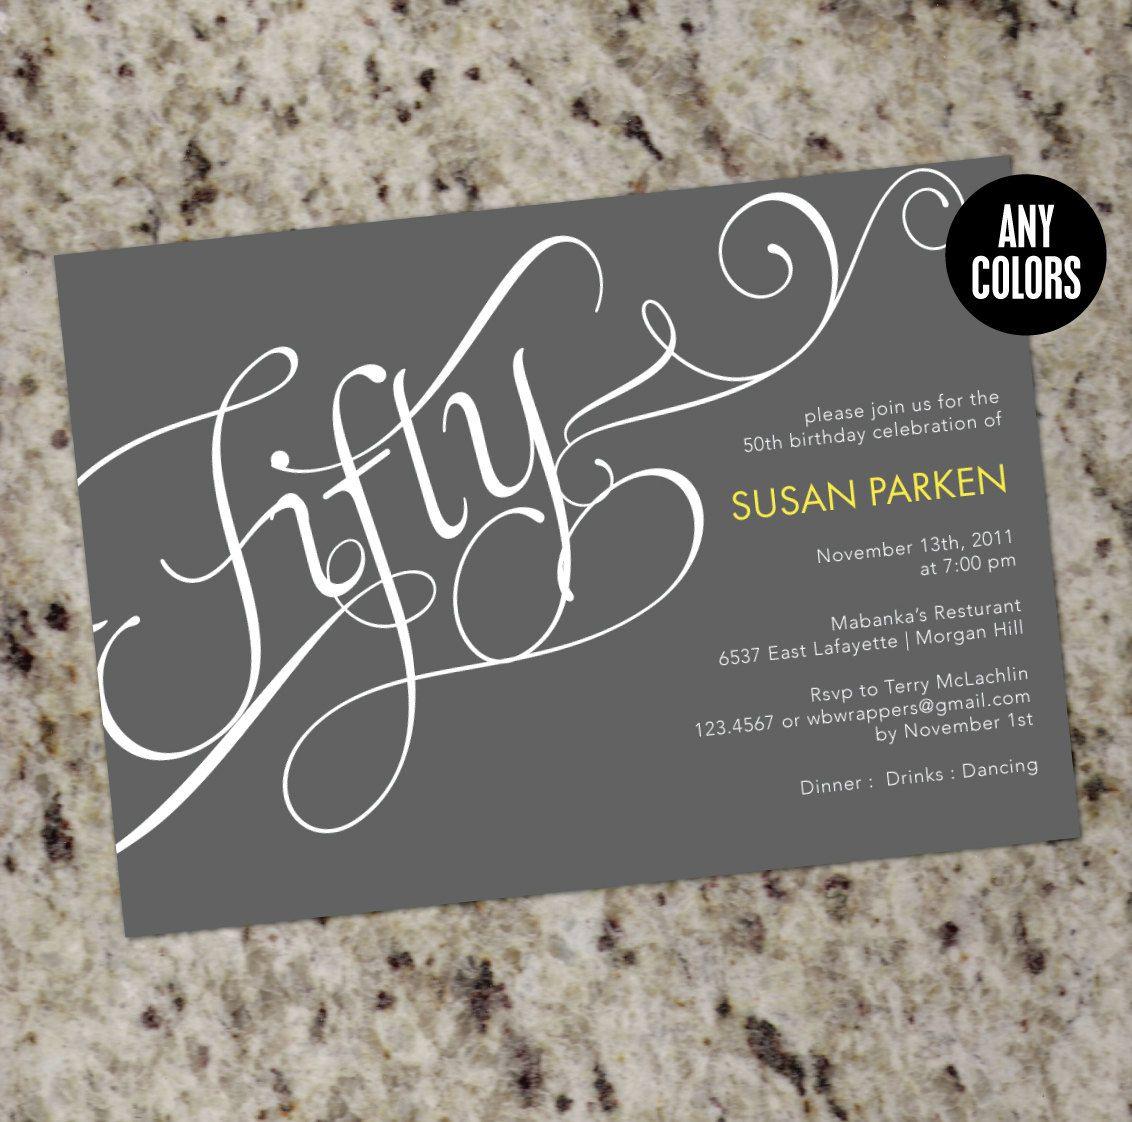 Milestone Birthday Invitation or Event Invitation CALLIGRAPHY – Design a Birthday Invitation